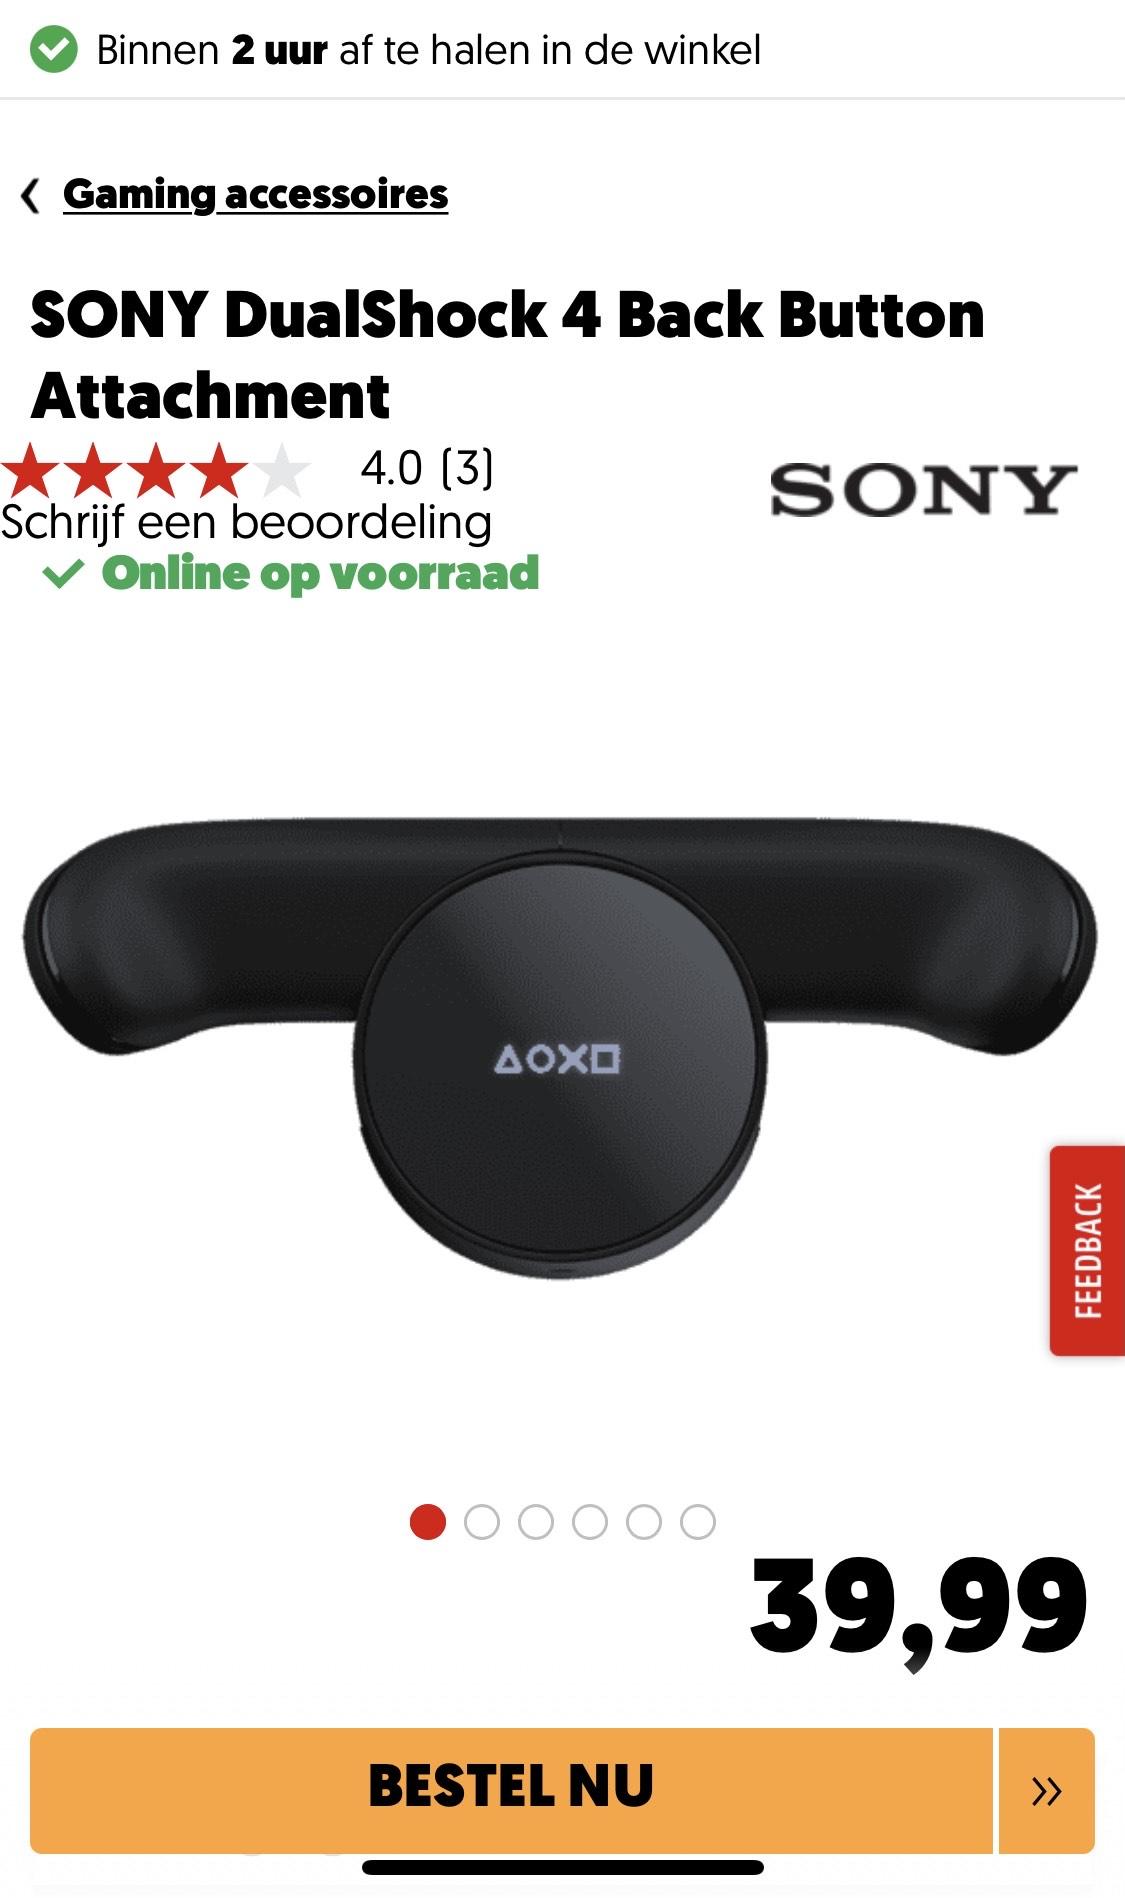 Sony Dualshock 4 Back Button